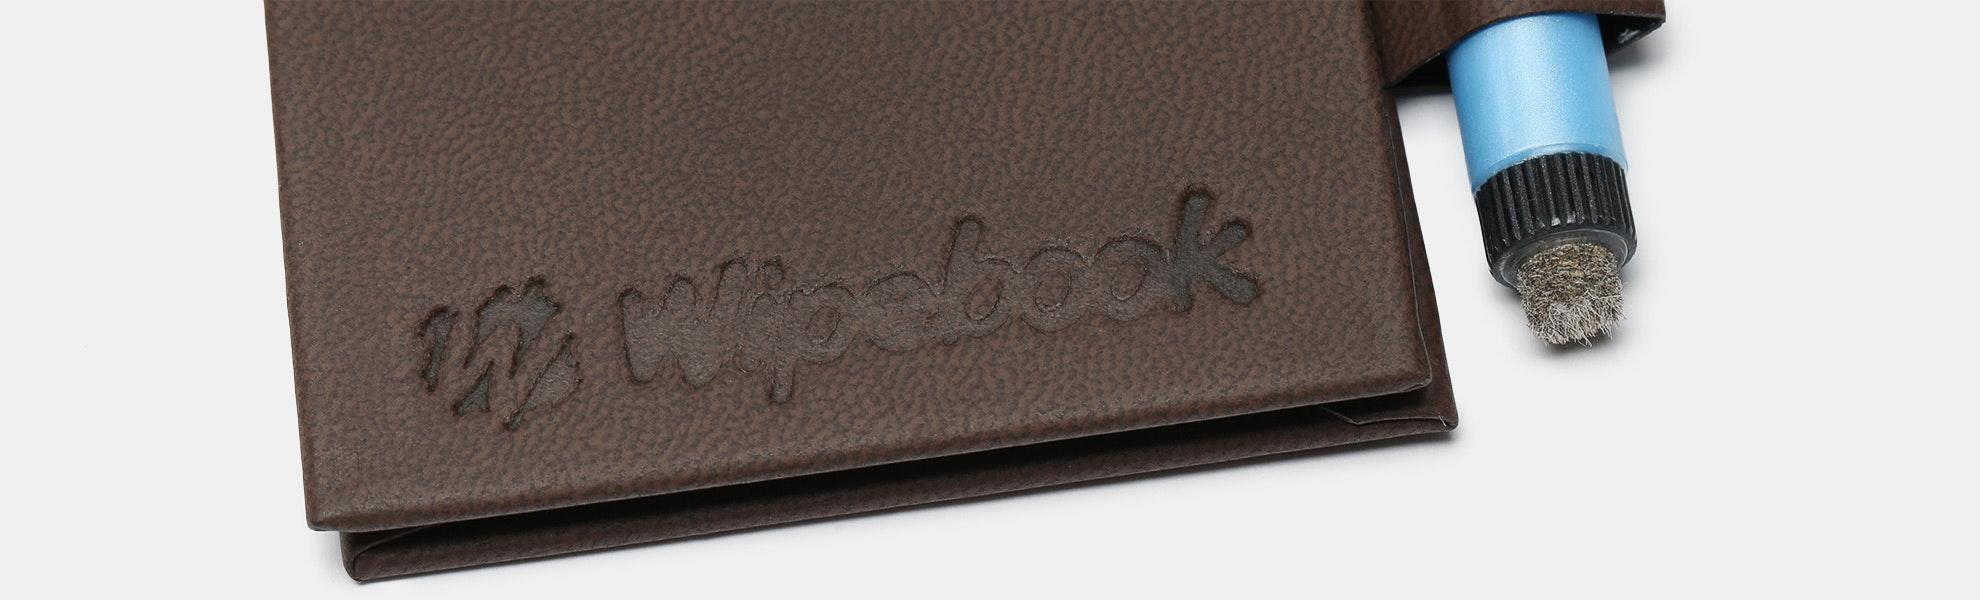 Pocket Wipebook Pro